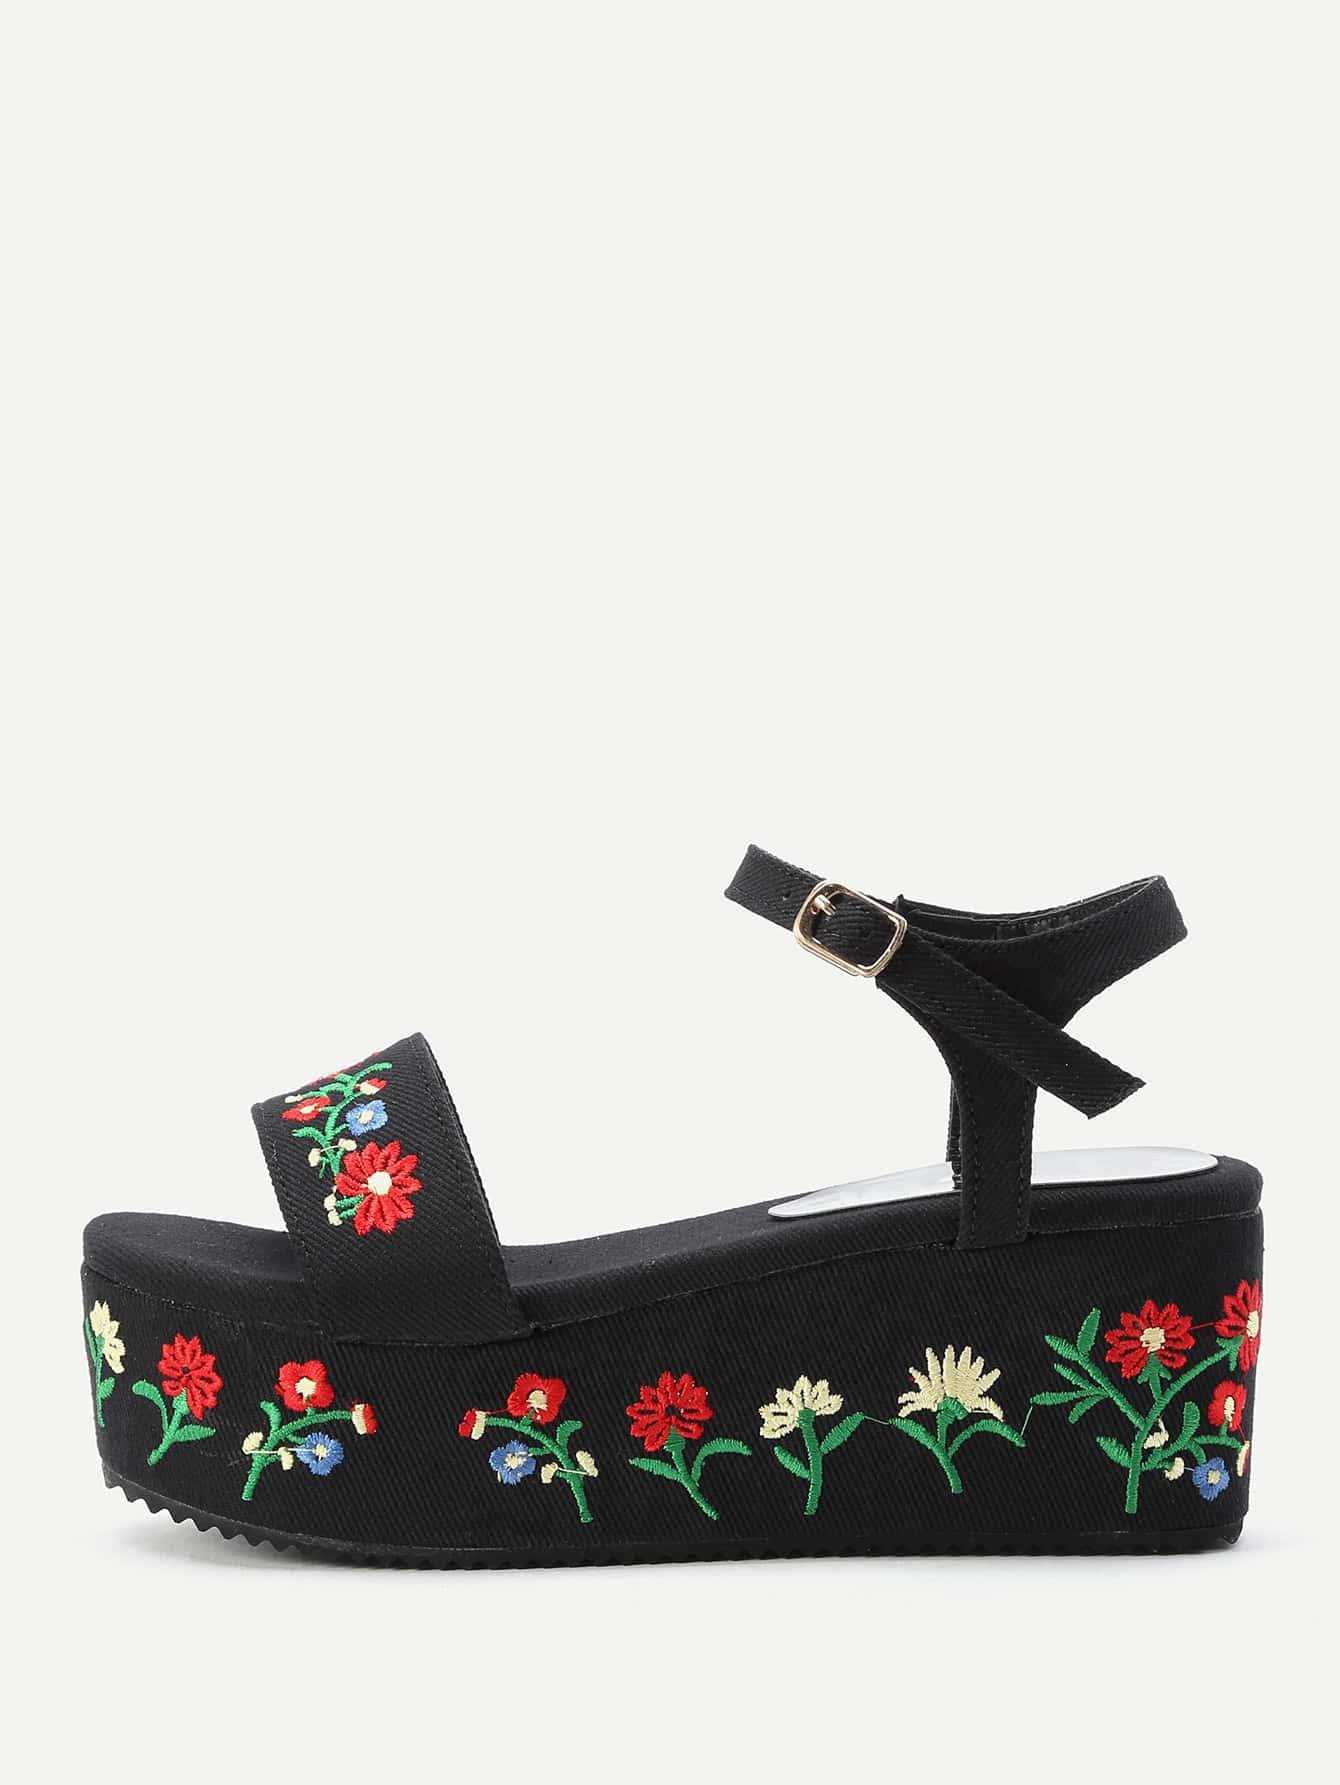 Flower Embroidery Denim Wedge Sandals